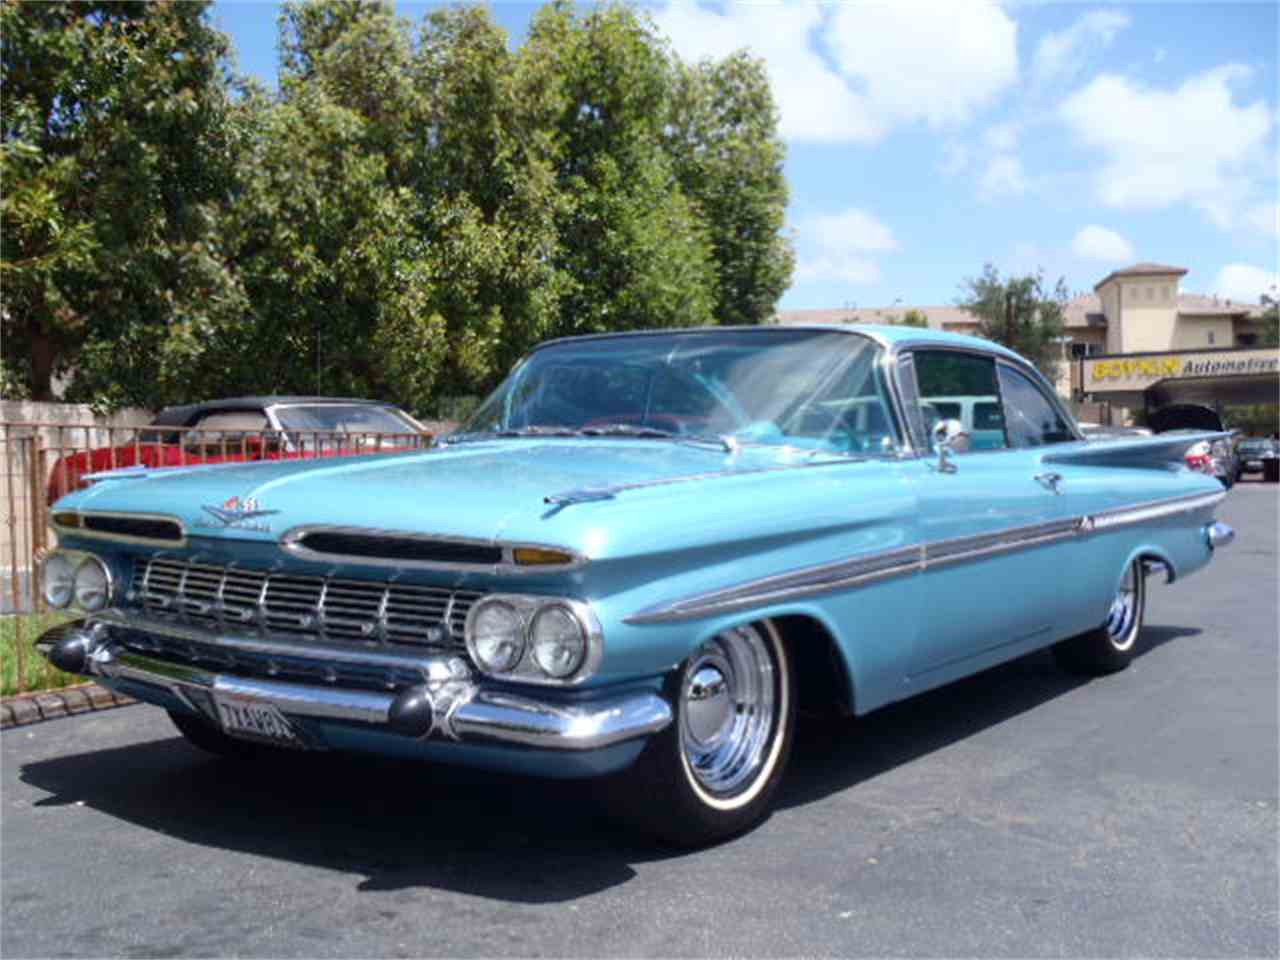 Classic Cars For Sale California Usa: 1959 Chevrolet Impala For Sale